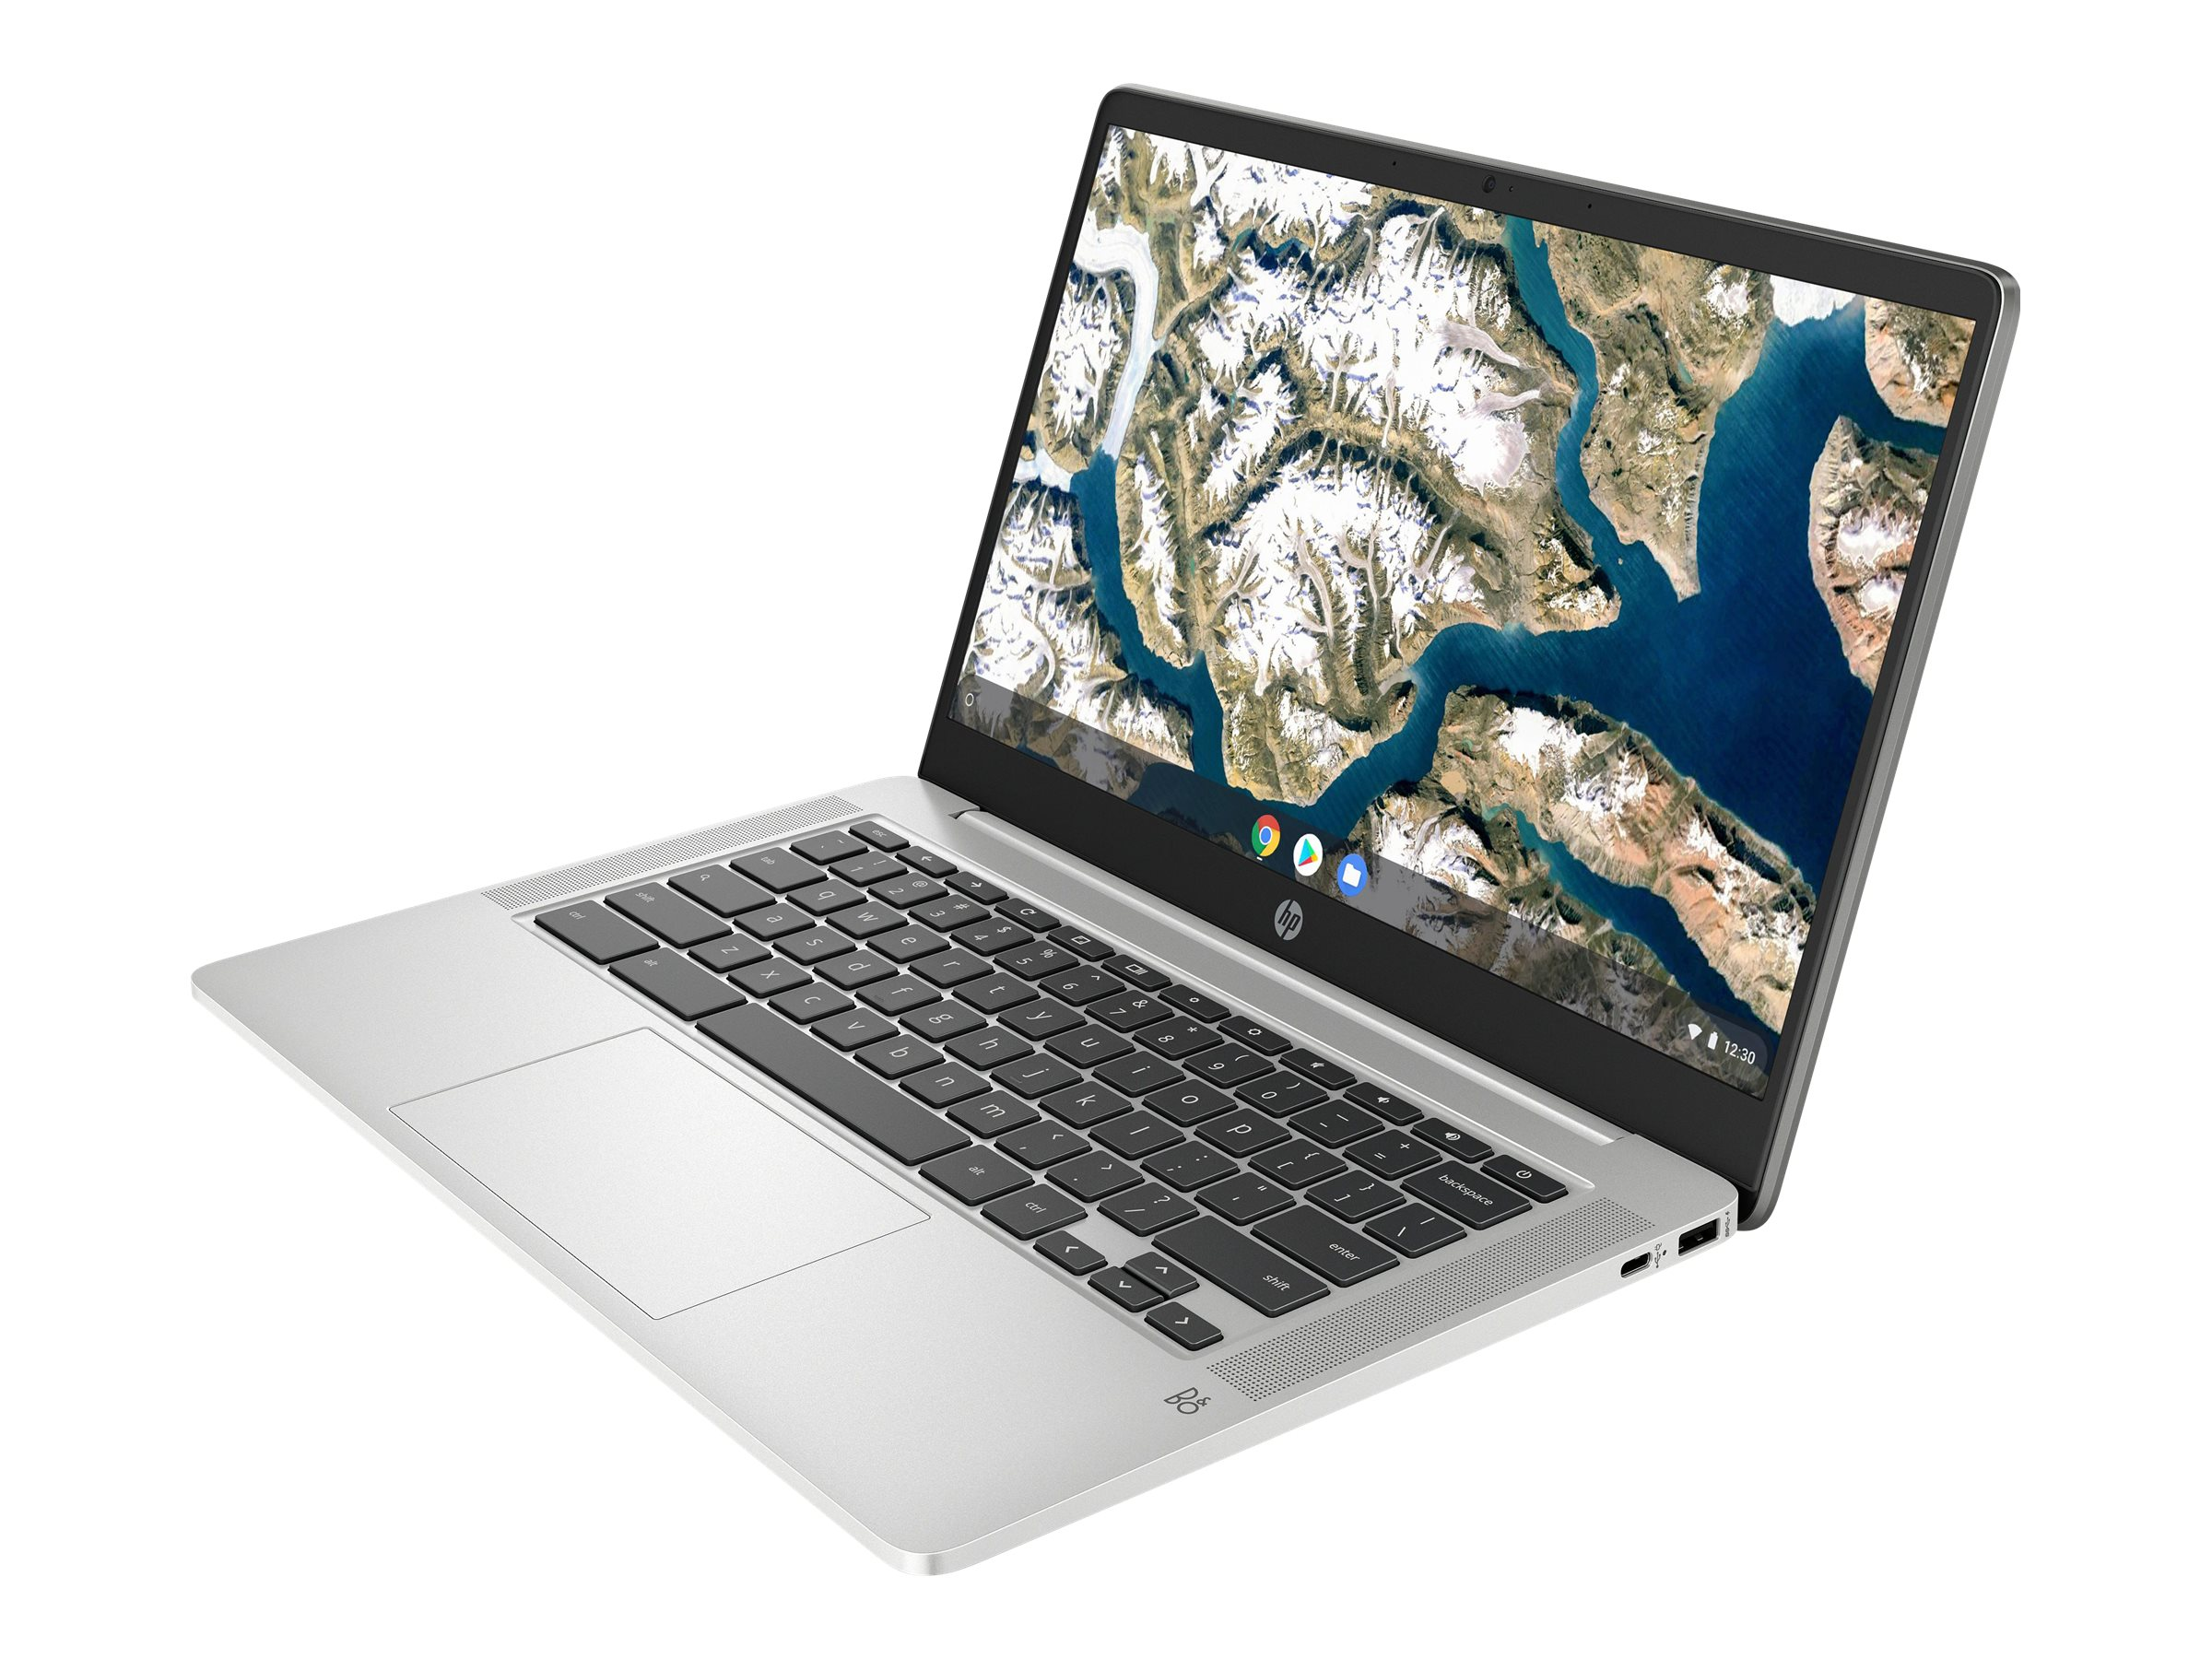 "HP Chromebook 14a-na0031ng - Pentium Silver N5030 / 1.1 GHz - Chrome OS - 4 GB RAM - 64 GB eMMC - 35.6 cm (14"")"